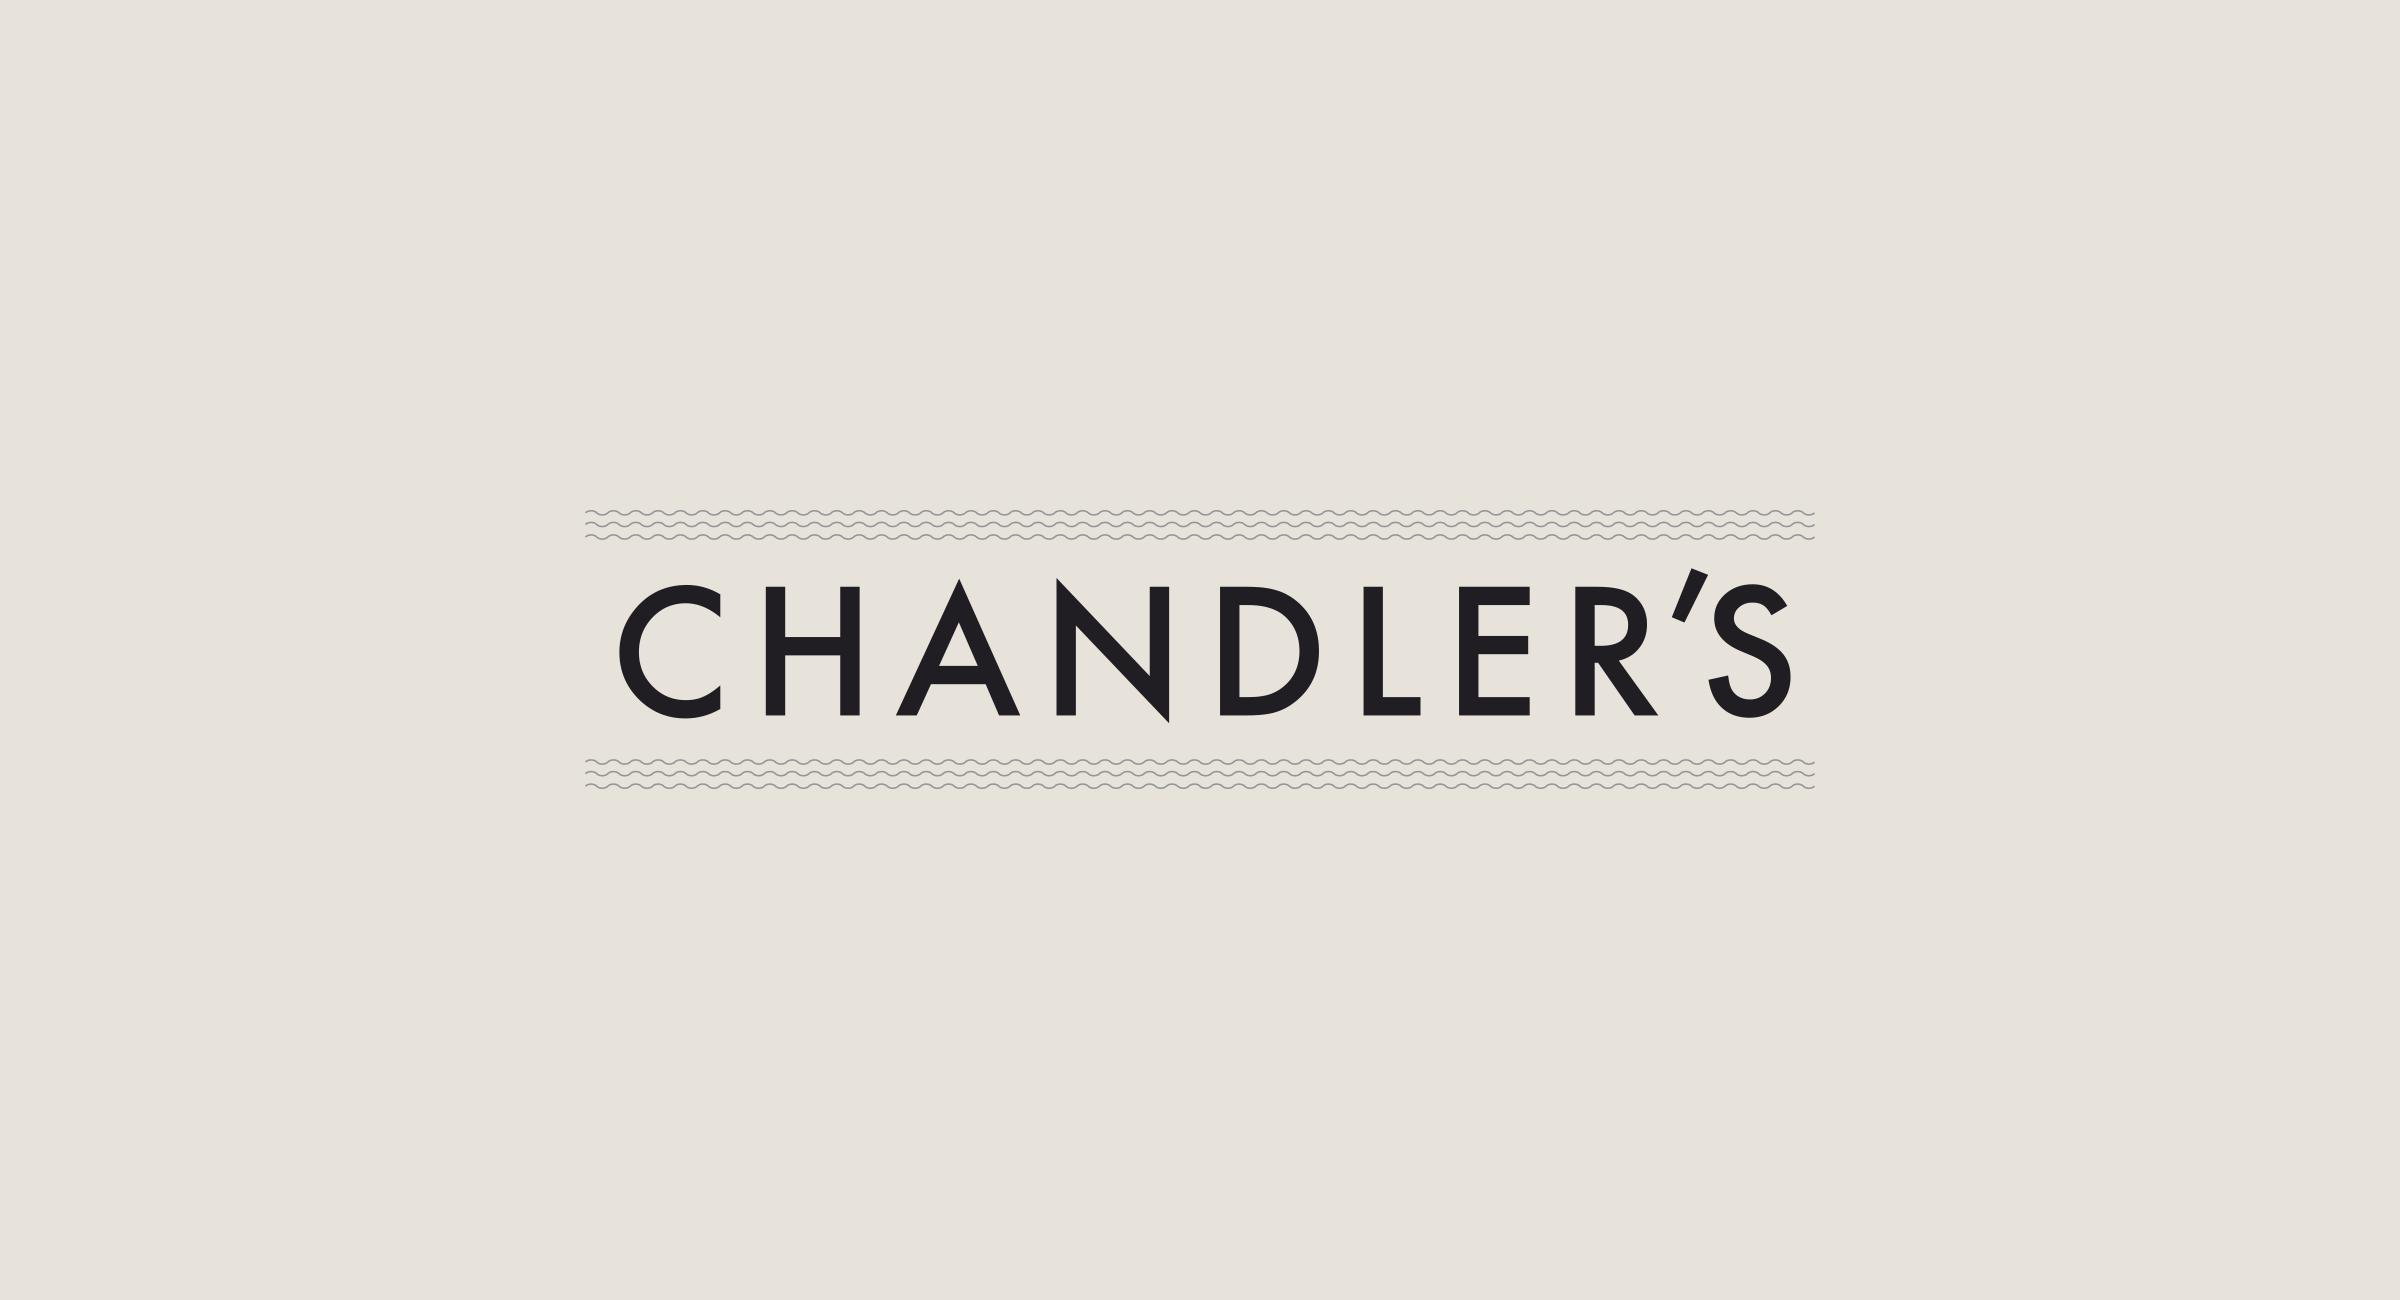 Hilton Chandler's Restaurant Identity